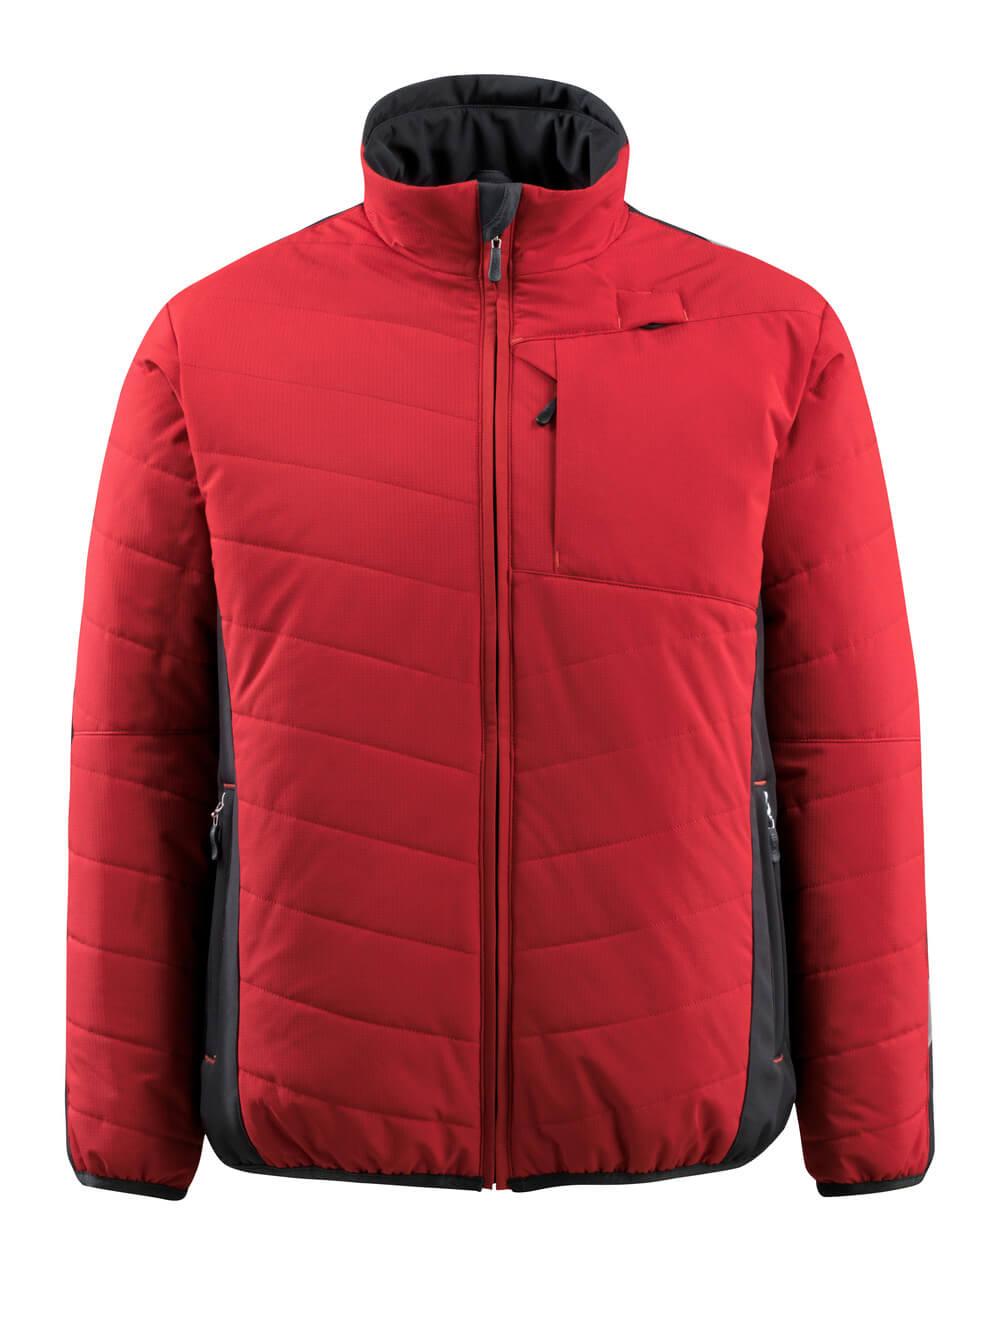 15615-249-0209 Termojacka - röd/svart